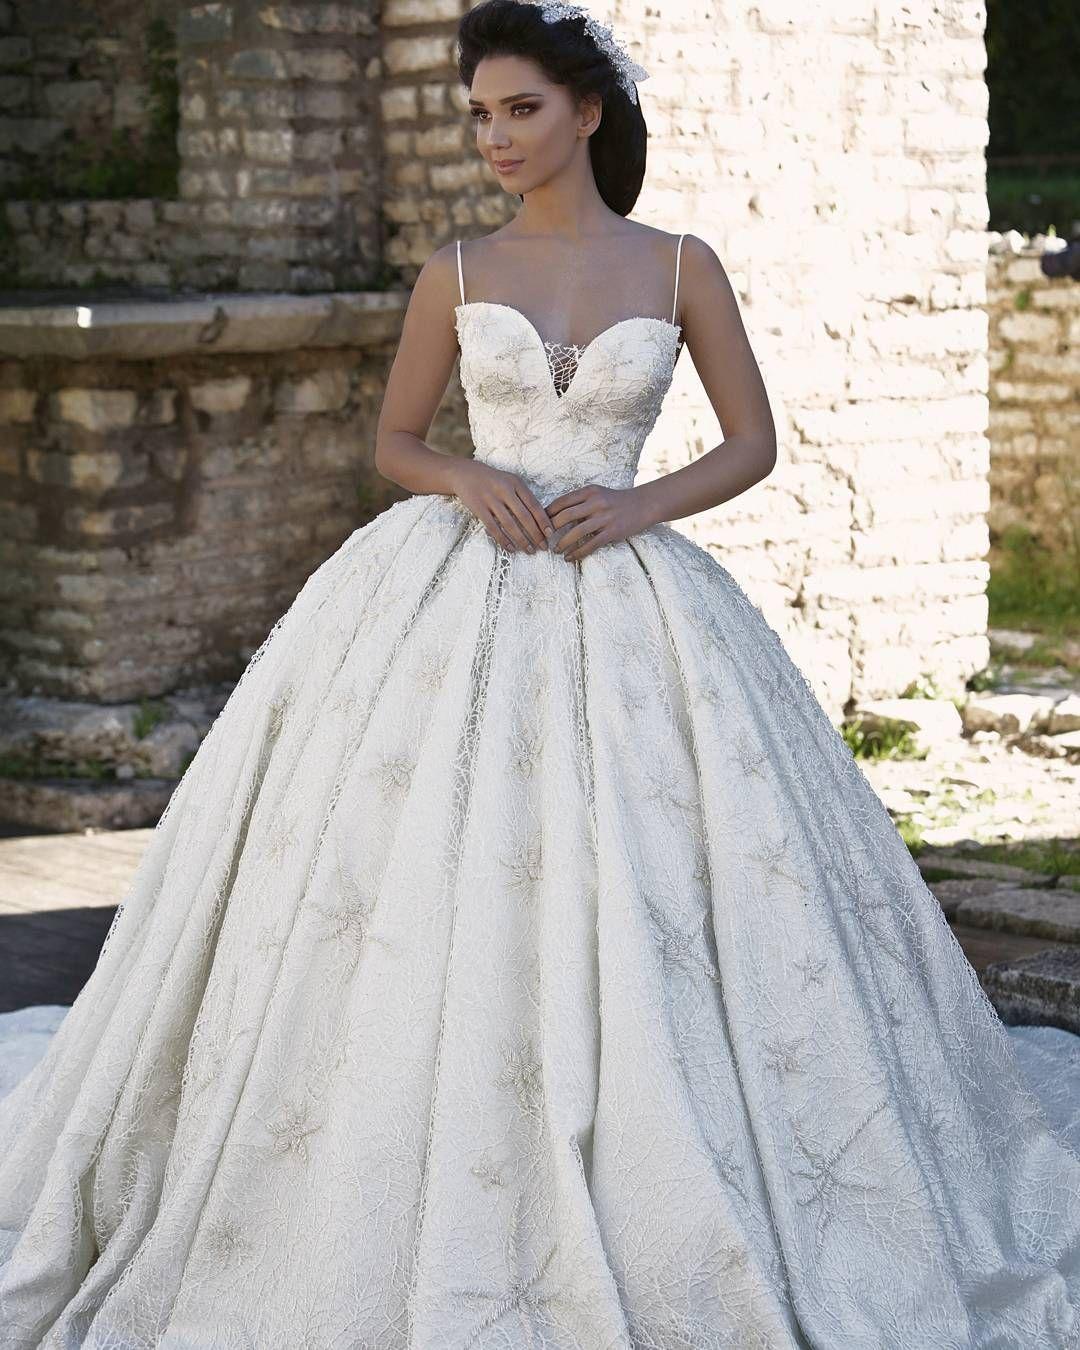 pinterest: @nayeliarroyo 👑 | My DREAM wedding | Pinterest | Wedding ...